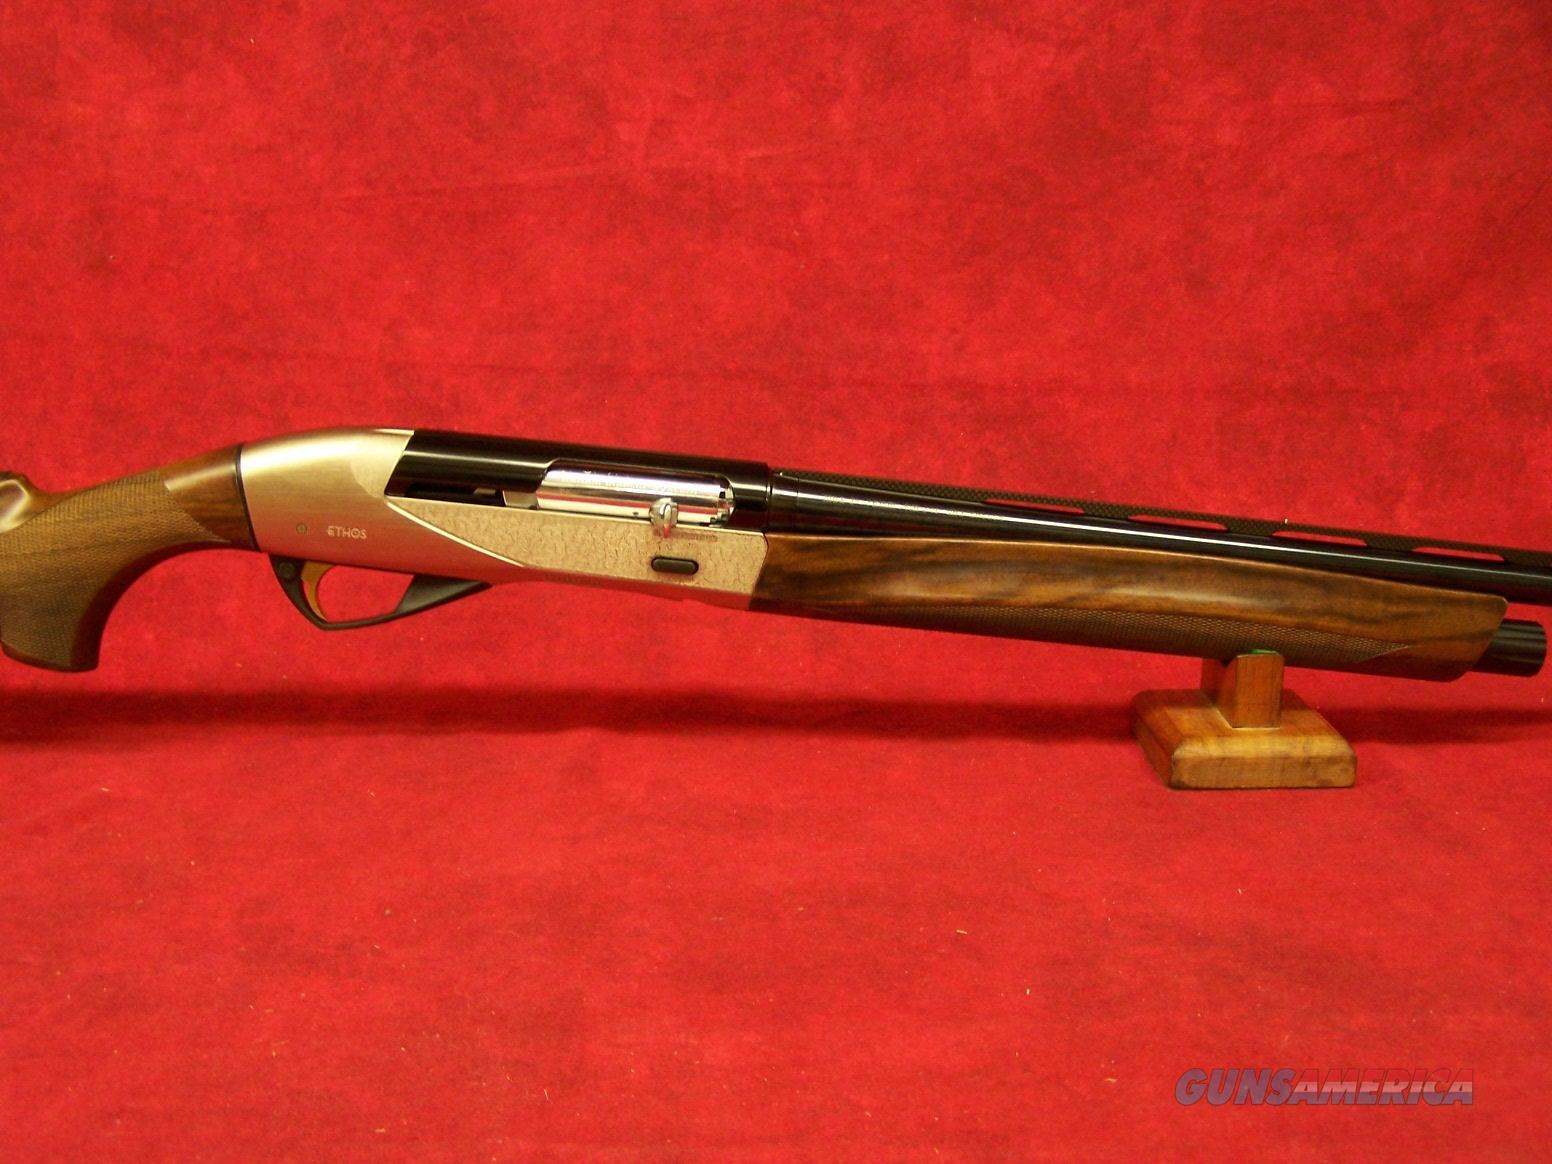 "Benelli Ethos 20 Ga 3"" AA-Grade Satin Walnut Nickel Engraved Progressive Comfort 26"" Barrel (10471)  Guns > Shotguns > Benelli Shotguns > Sporting"